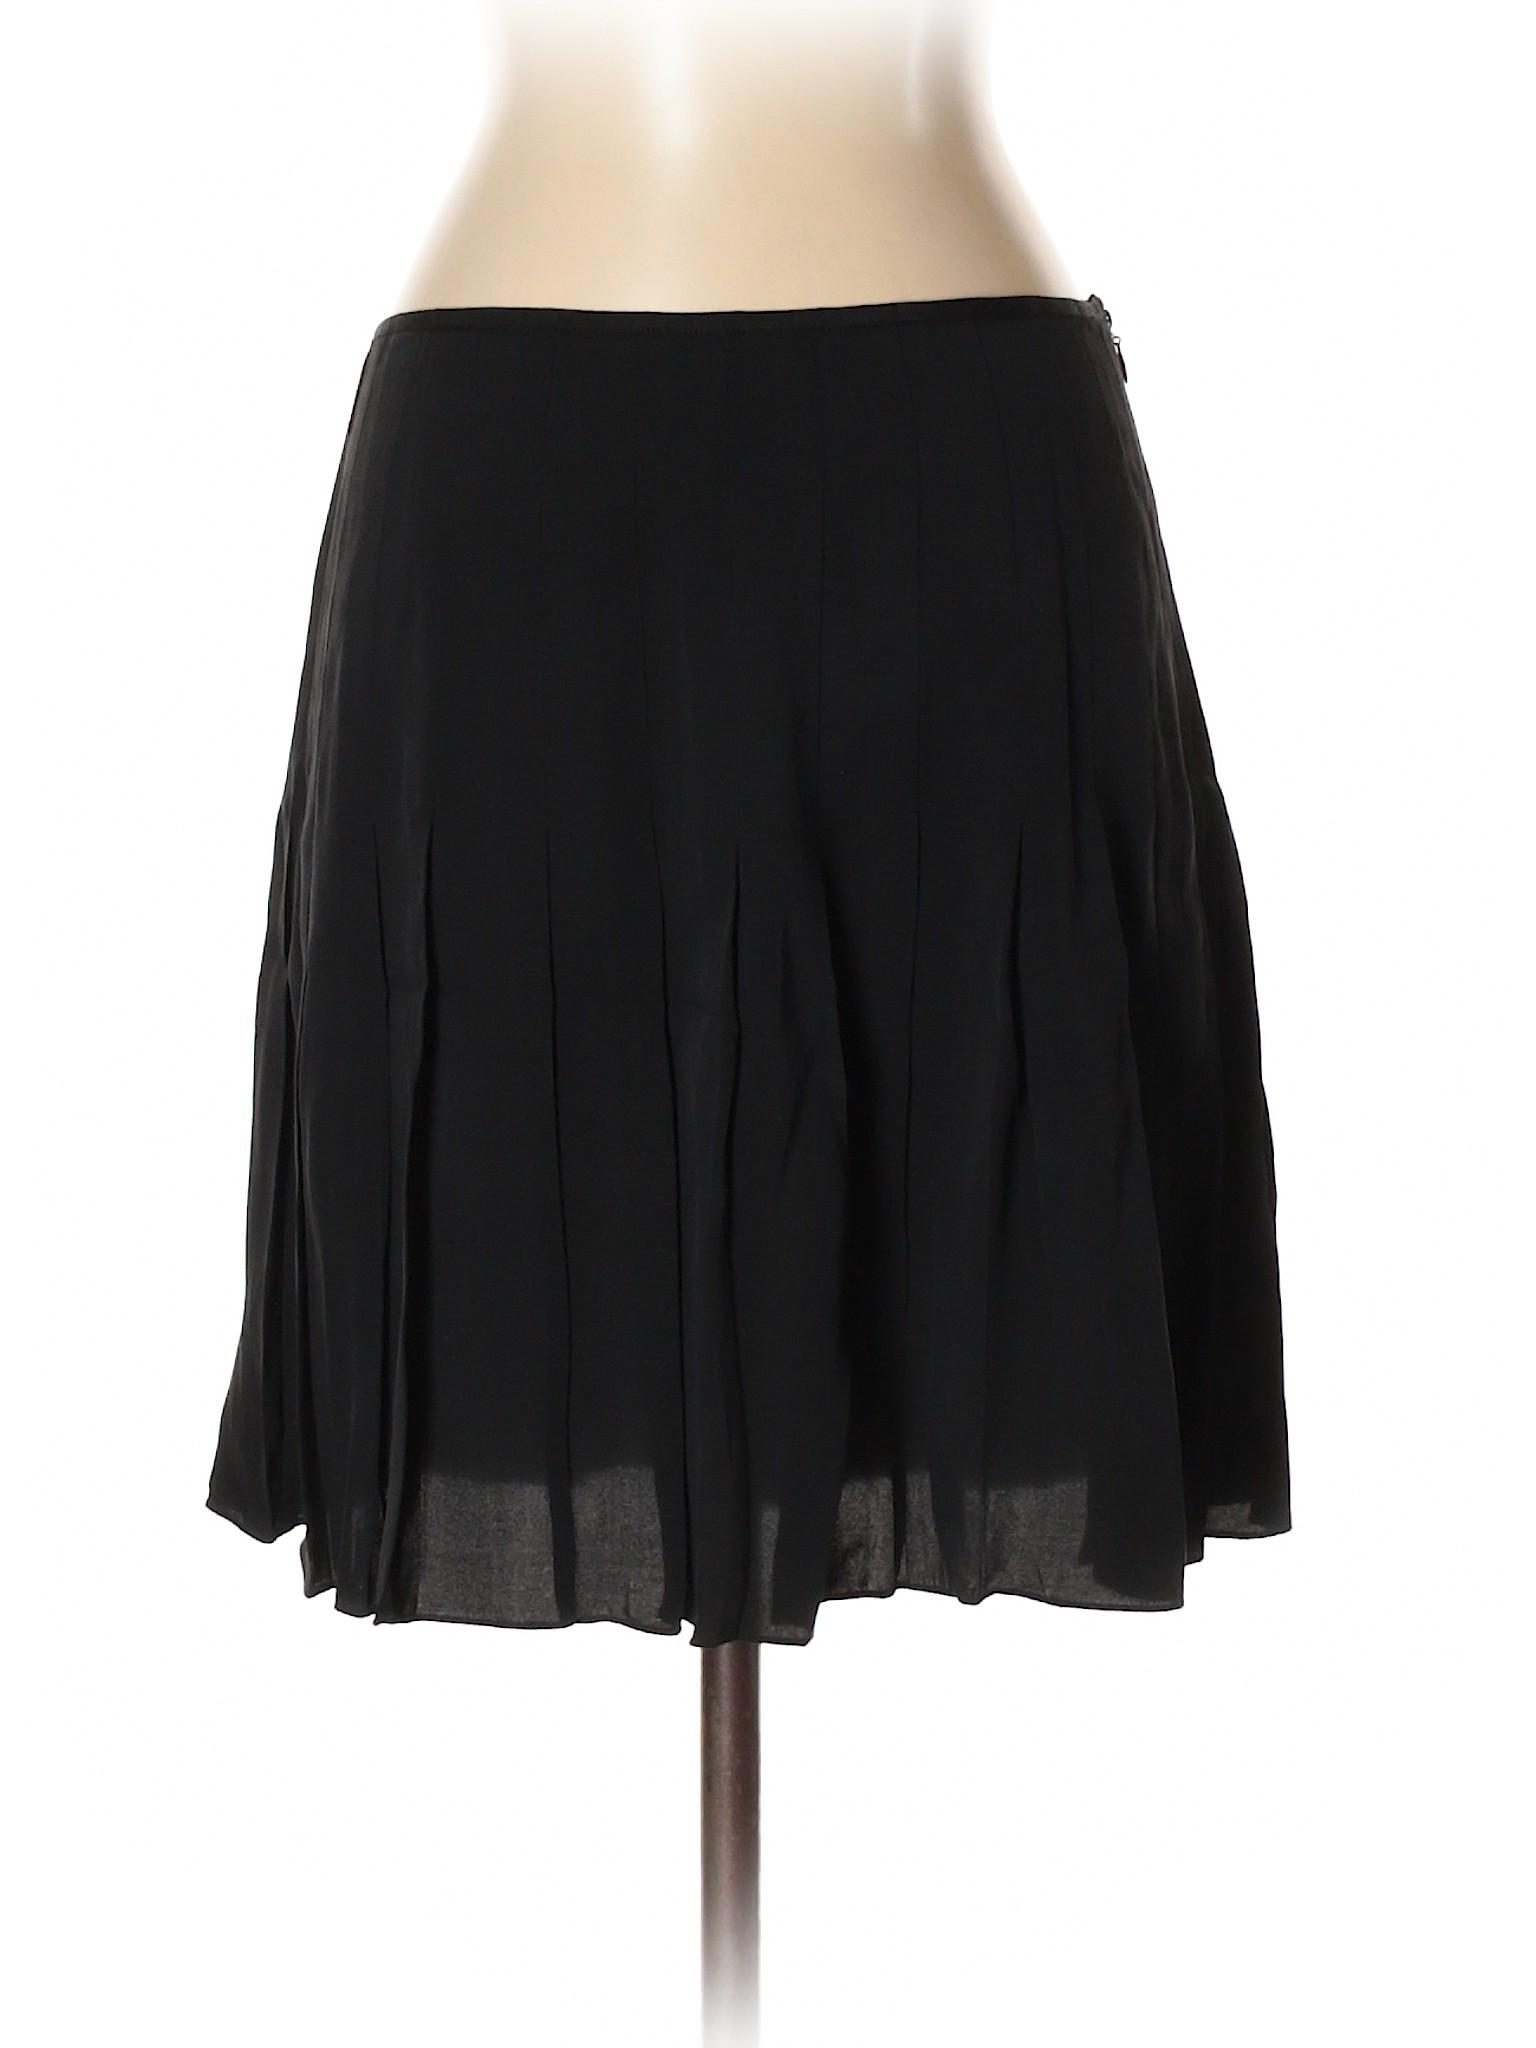 Elie Skirt Tahari Silk Boutique Boutique Elie Tahari YxHtqwnC